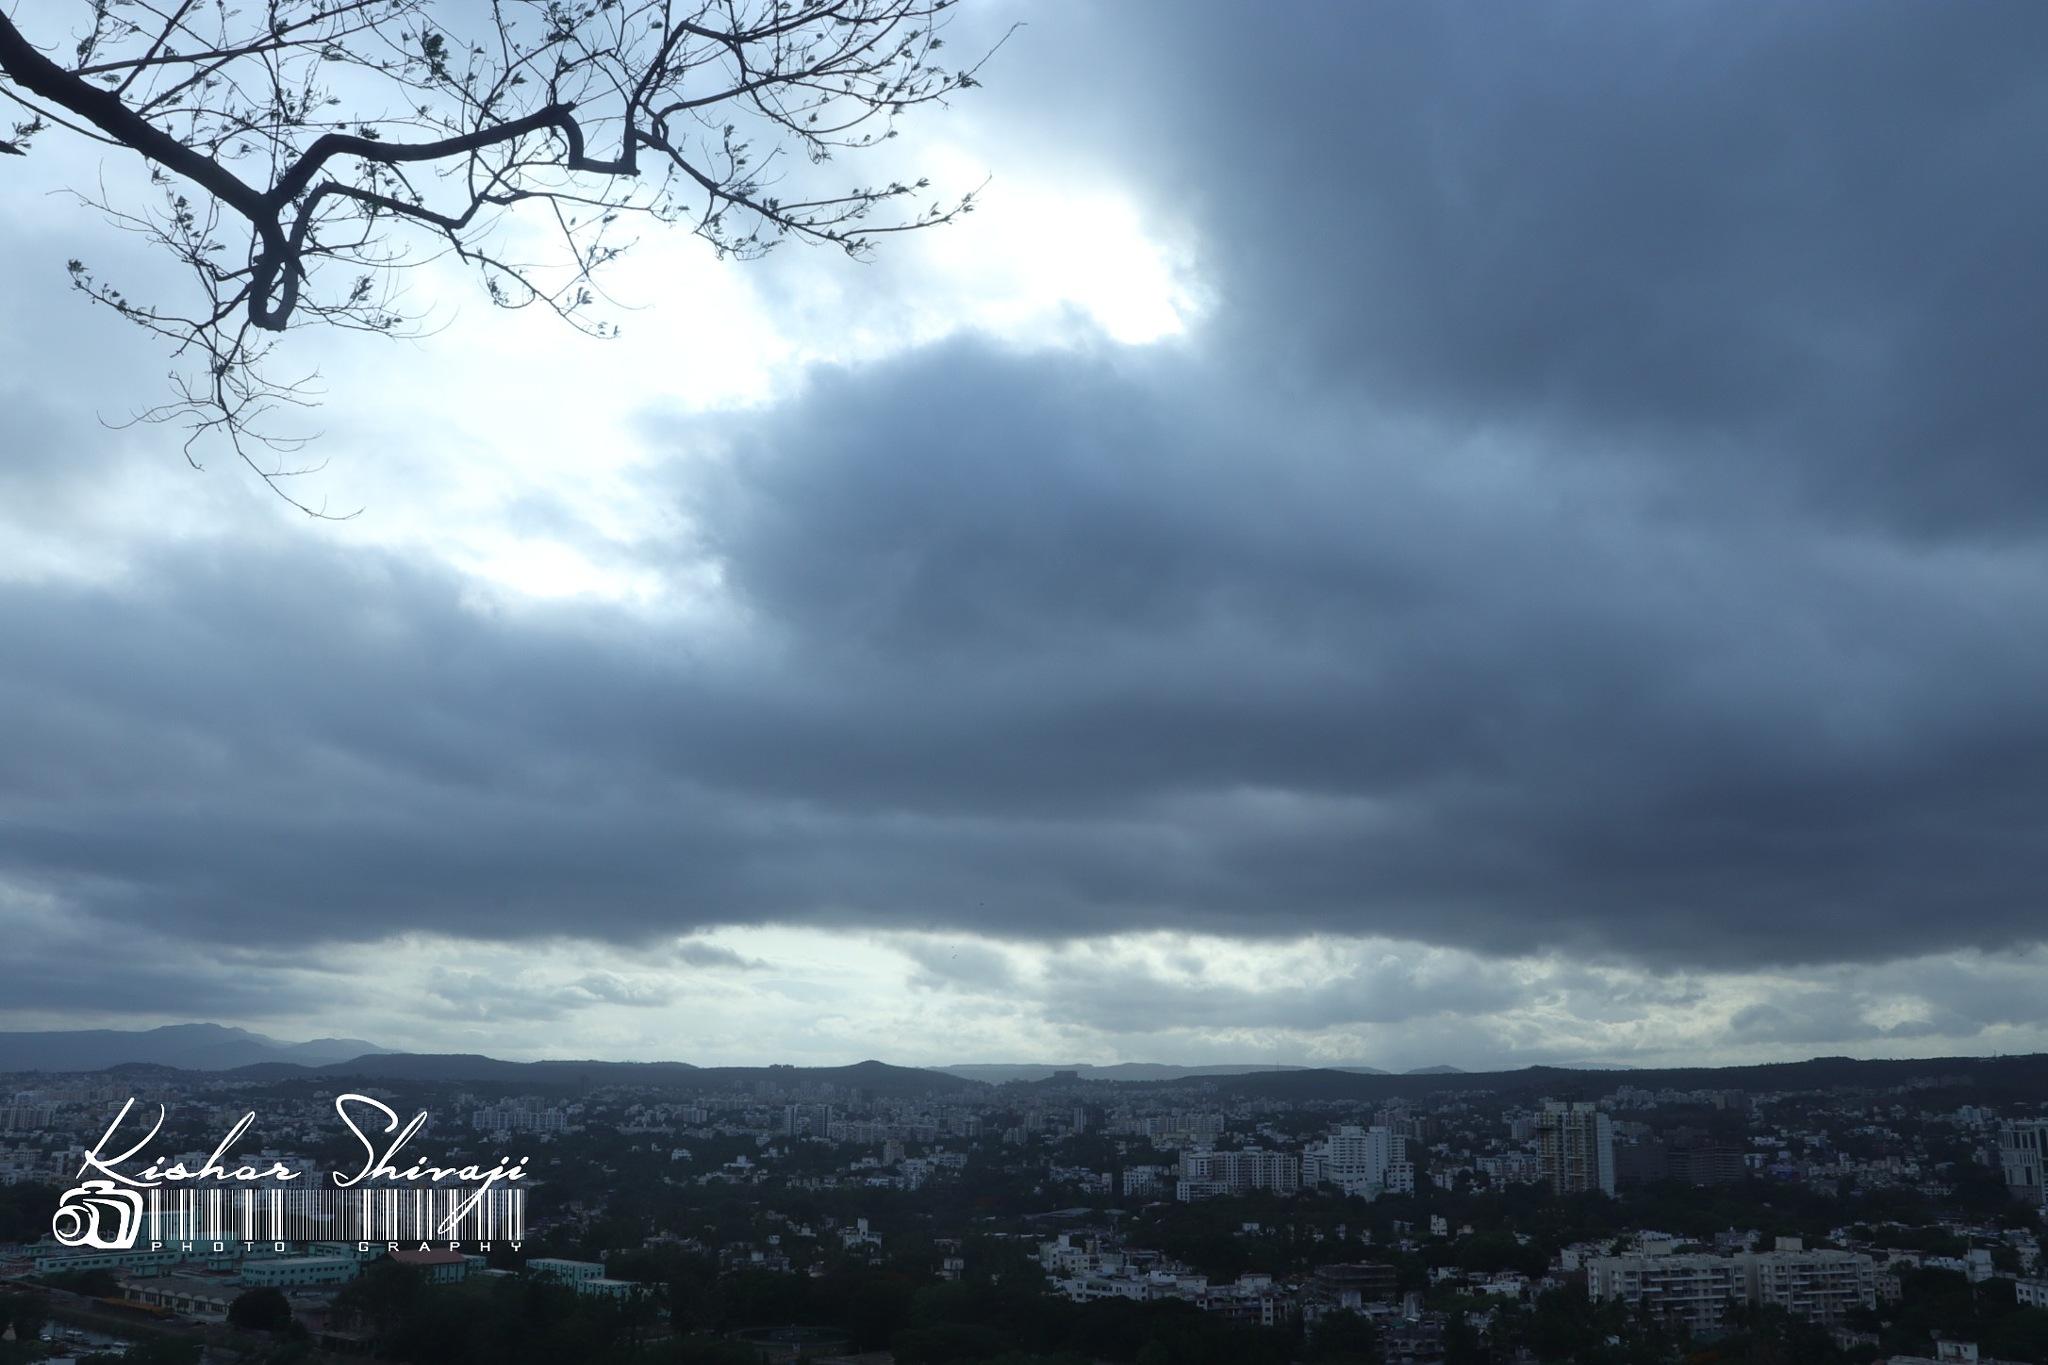 Untitled by Kishor_Shivaji